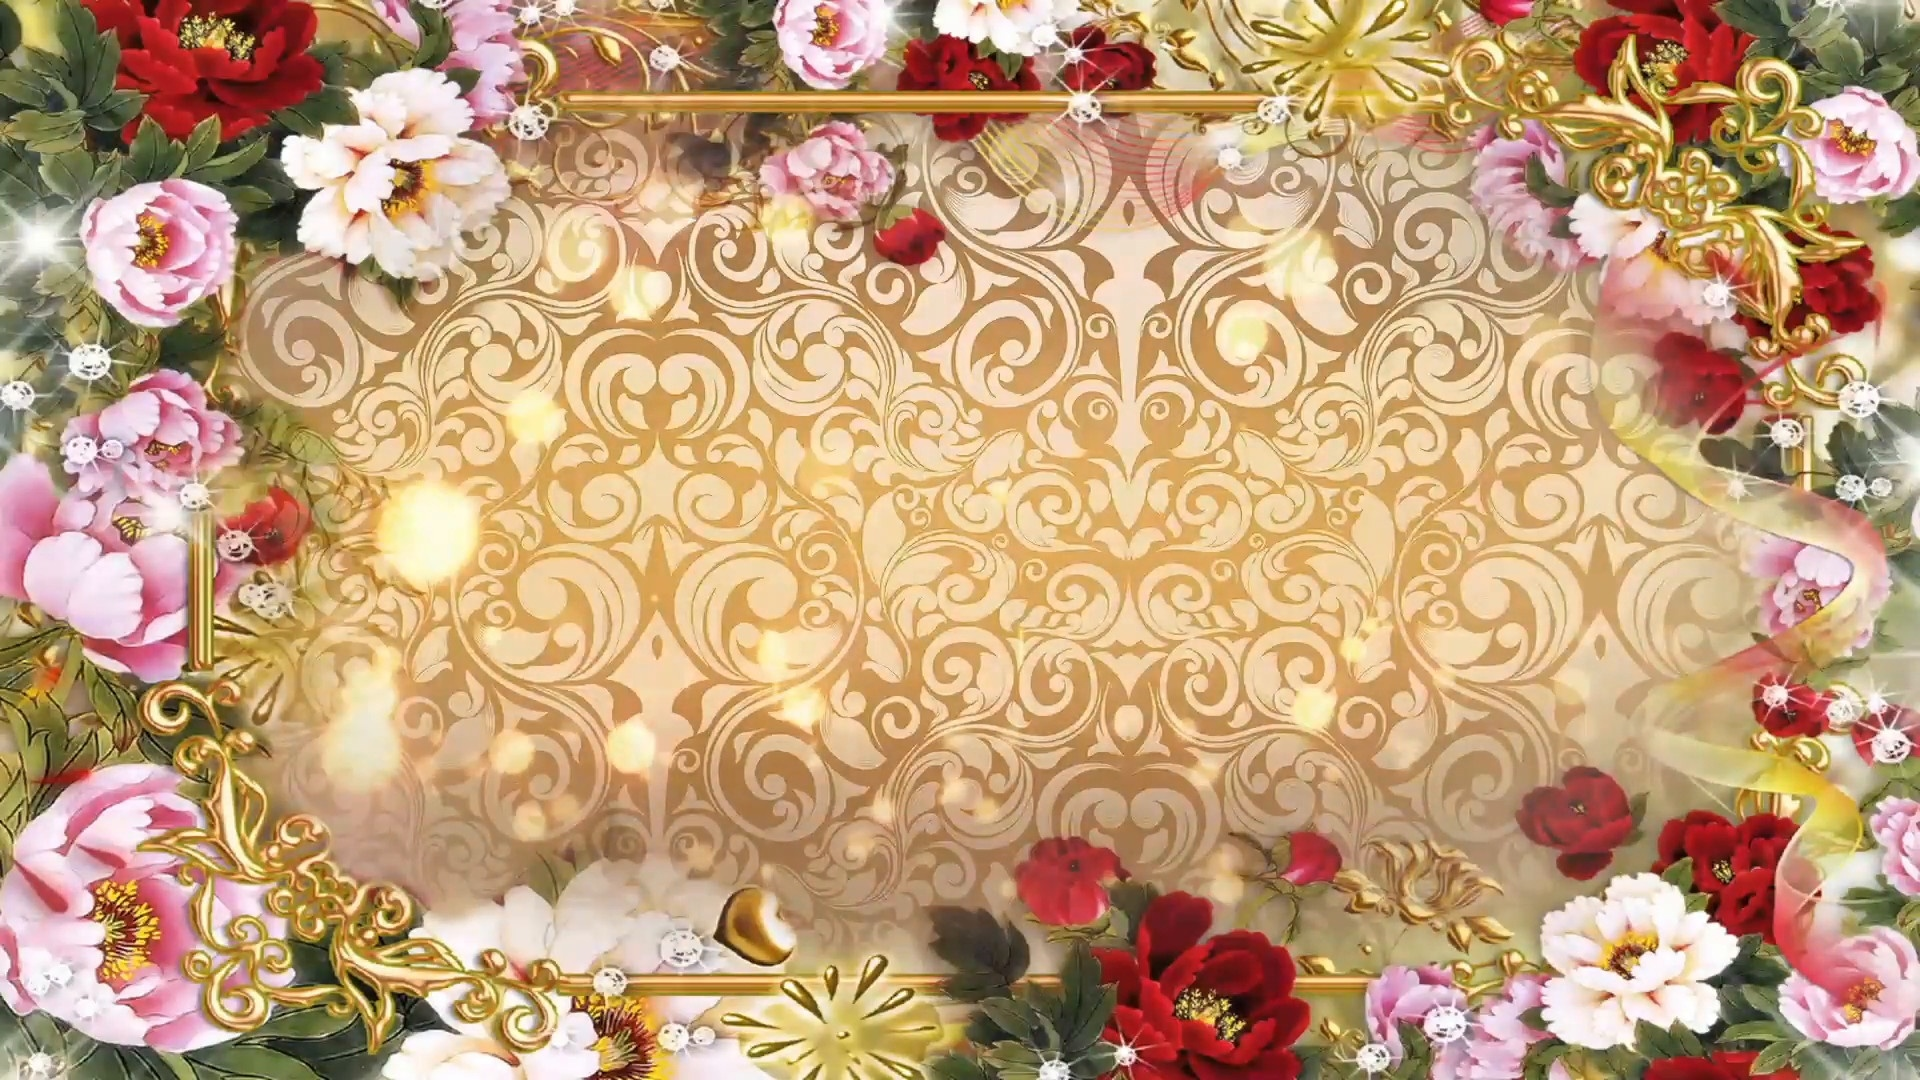 Wedding hd wallpaper download